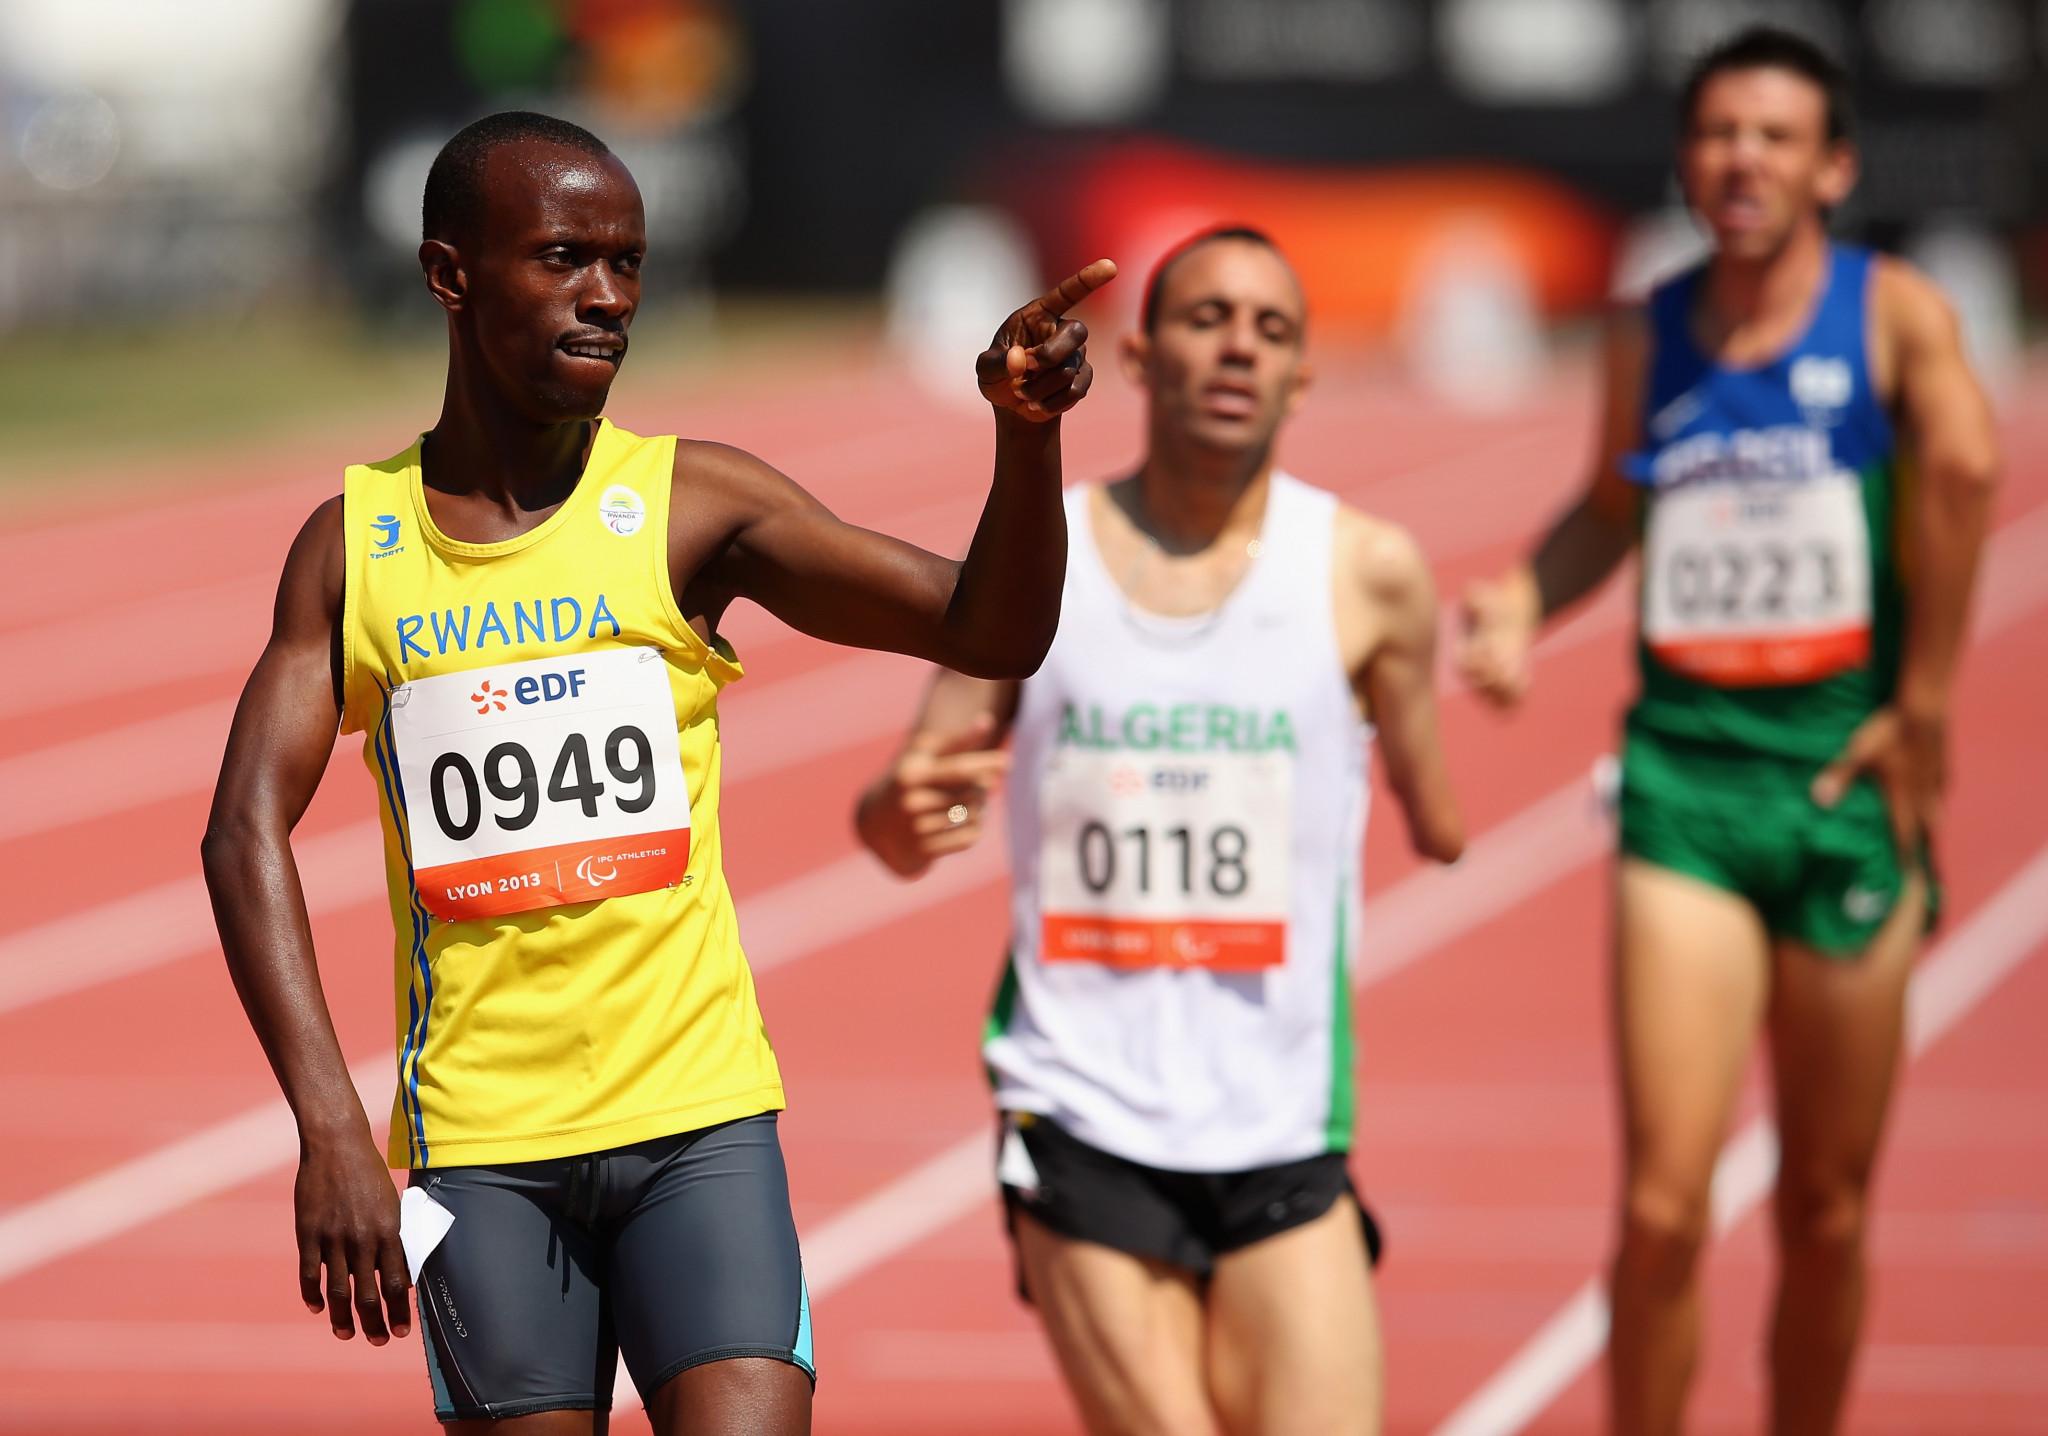 Rwanda's most successful Para athlete Muvunyi plans to retire after Paris 2024 Paralympics